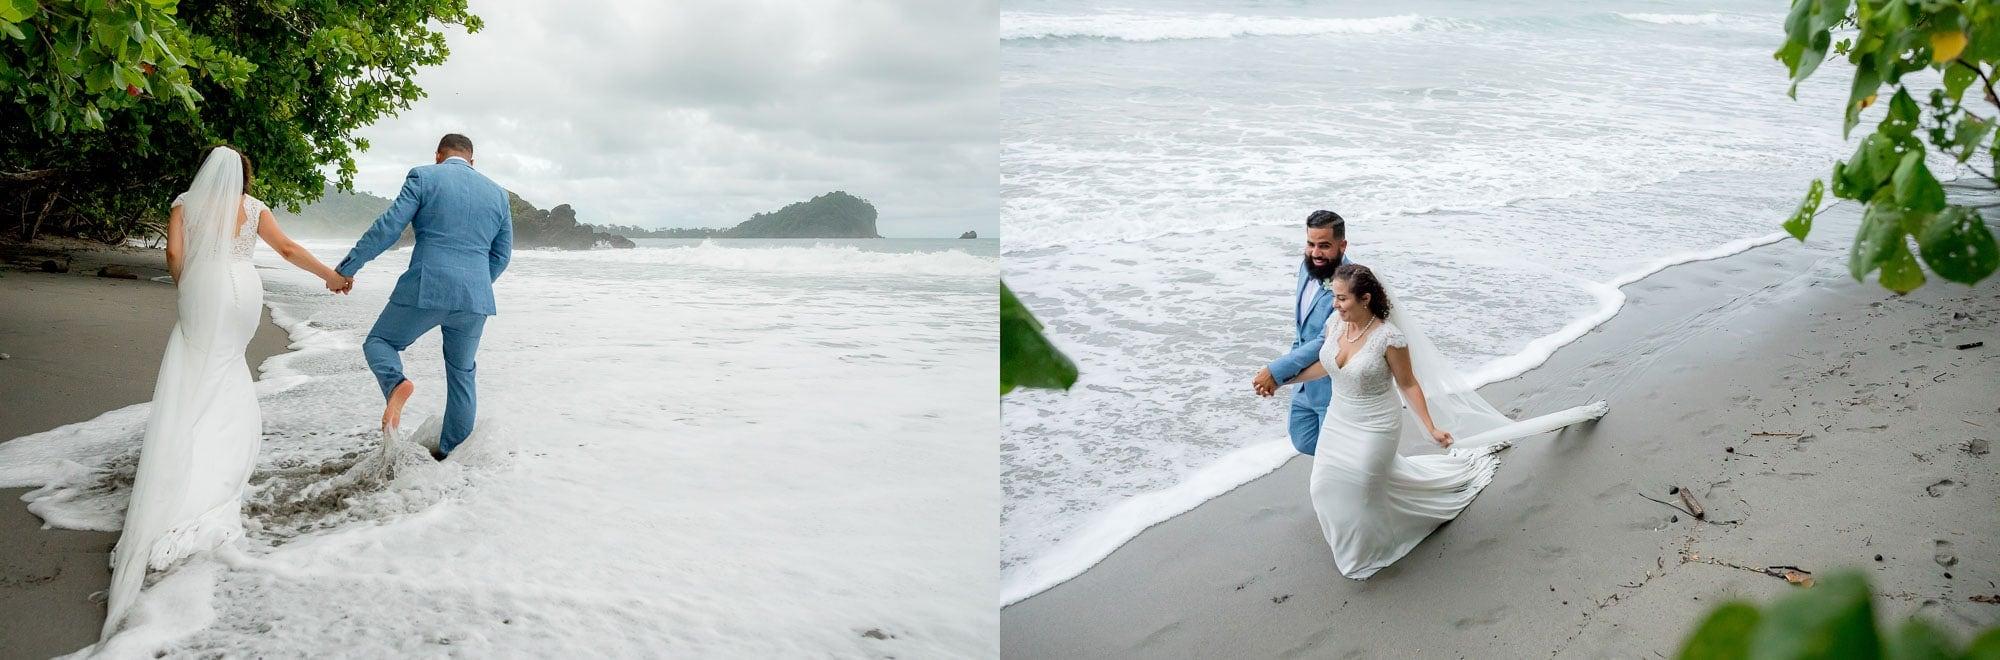 Dream destination wedding portraits on the beach